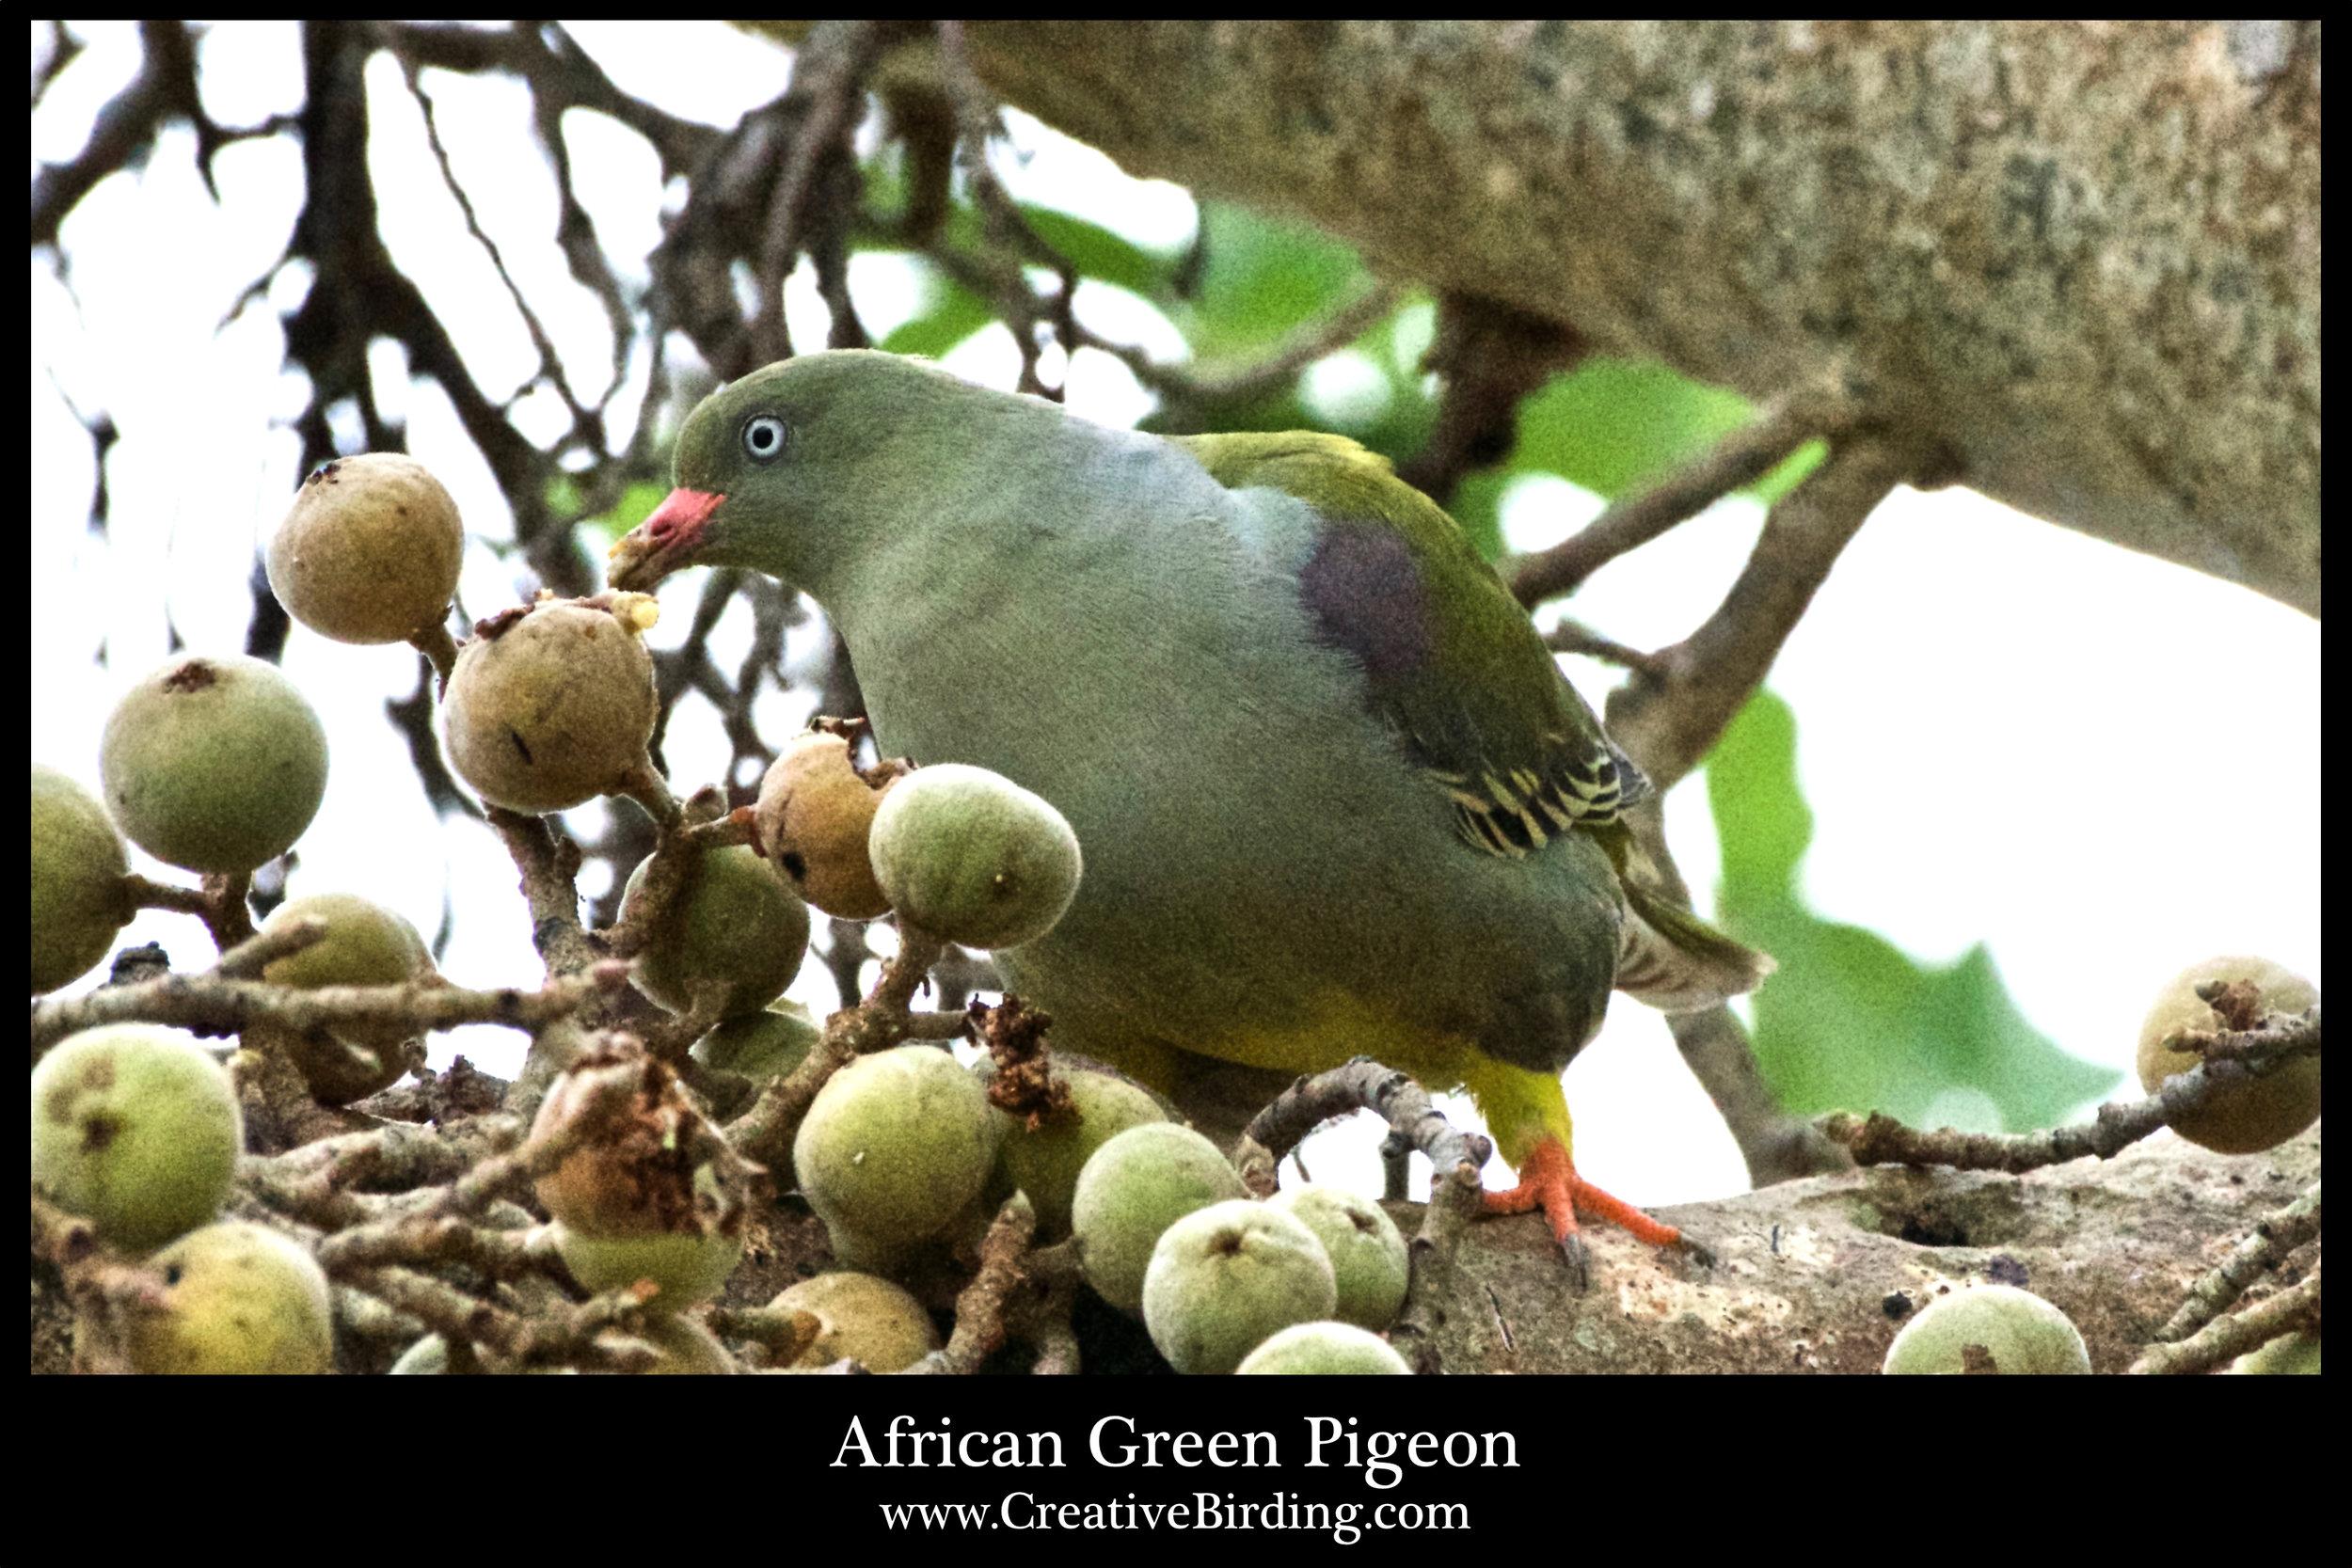 African Green Pigeon2.jpg